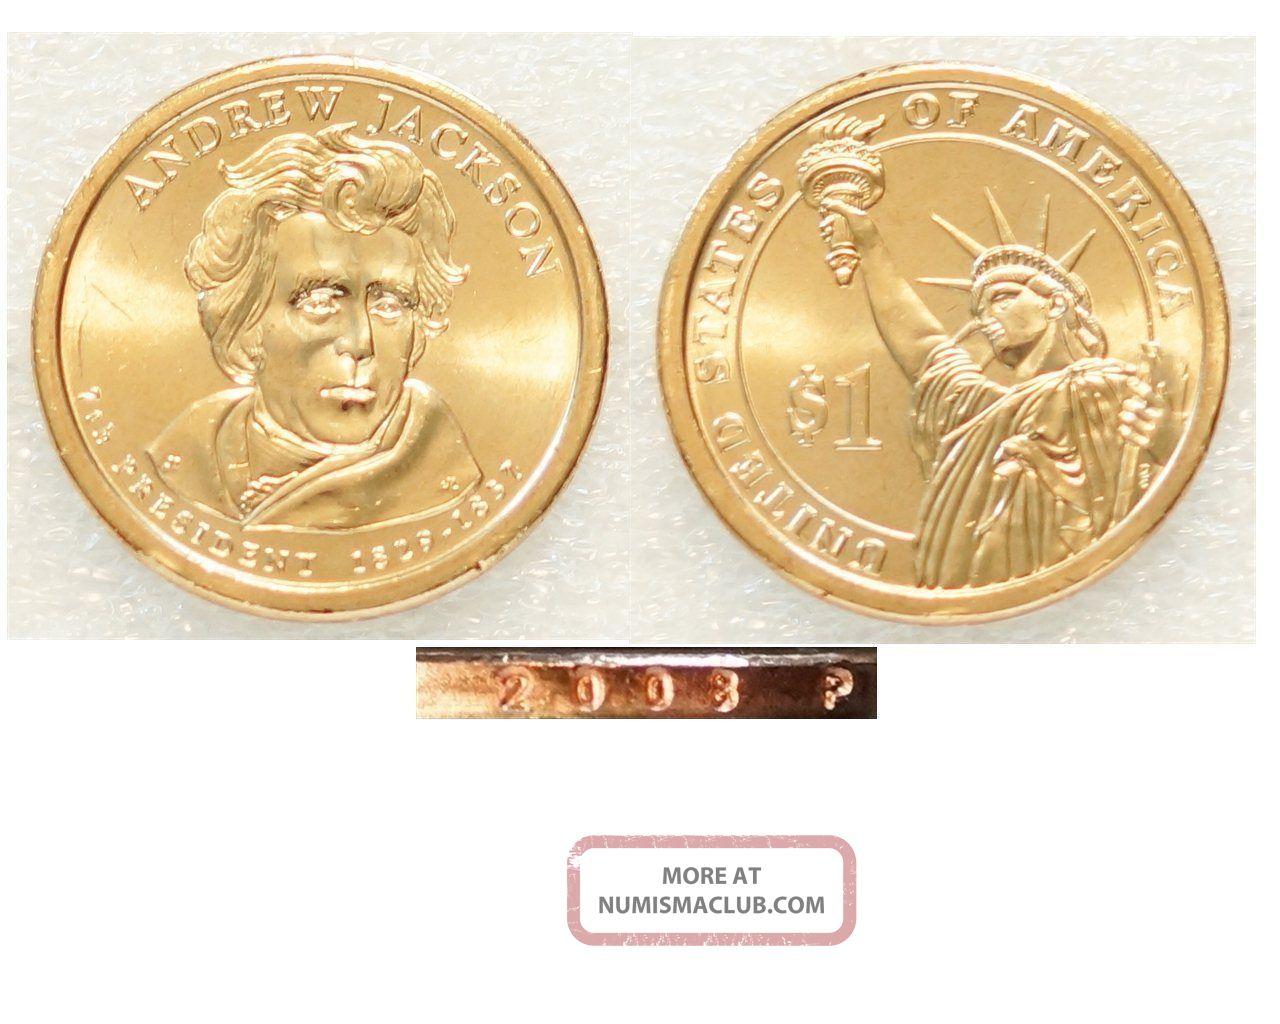 2008 - P $1 Andrew Jackson Presidential Dollar Us Coin Dollars photo